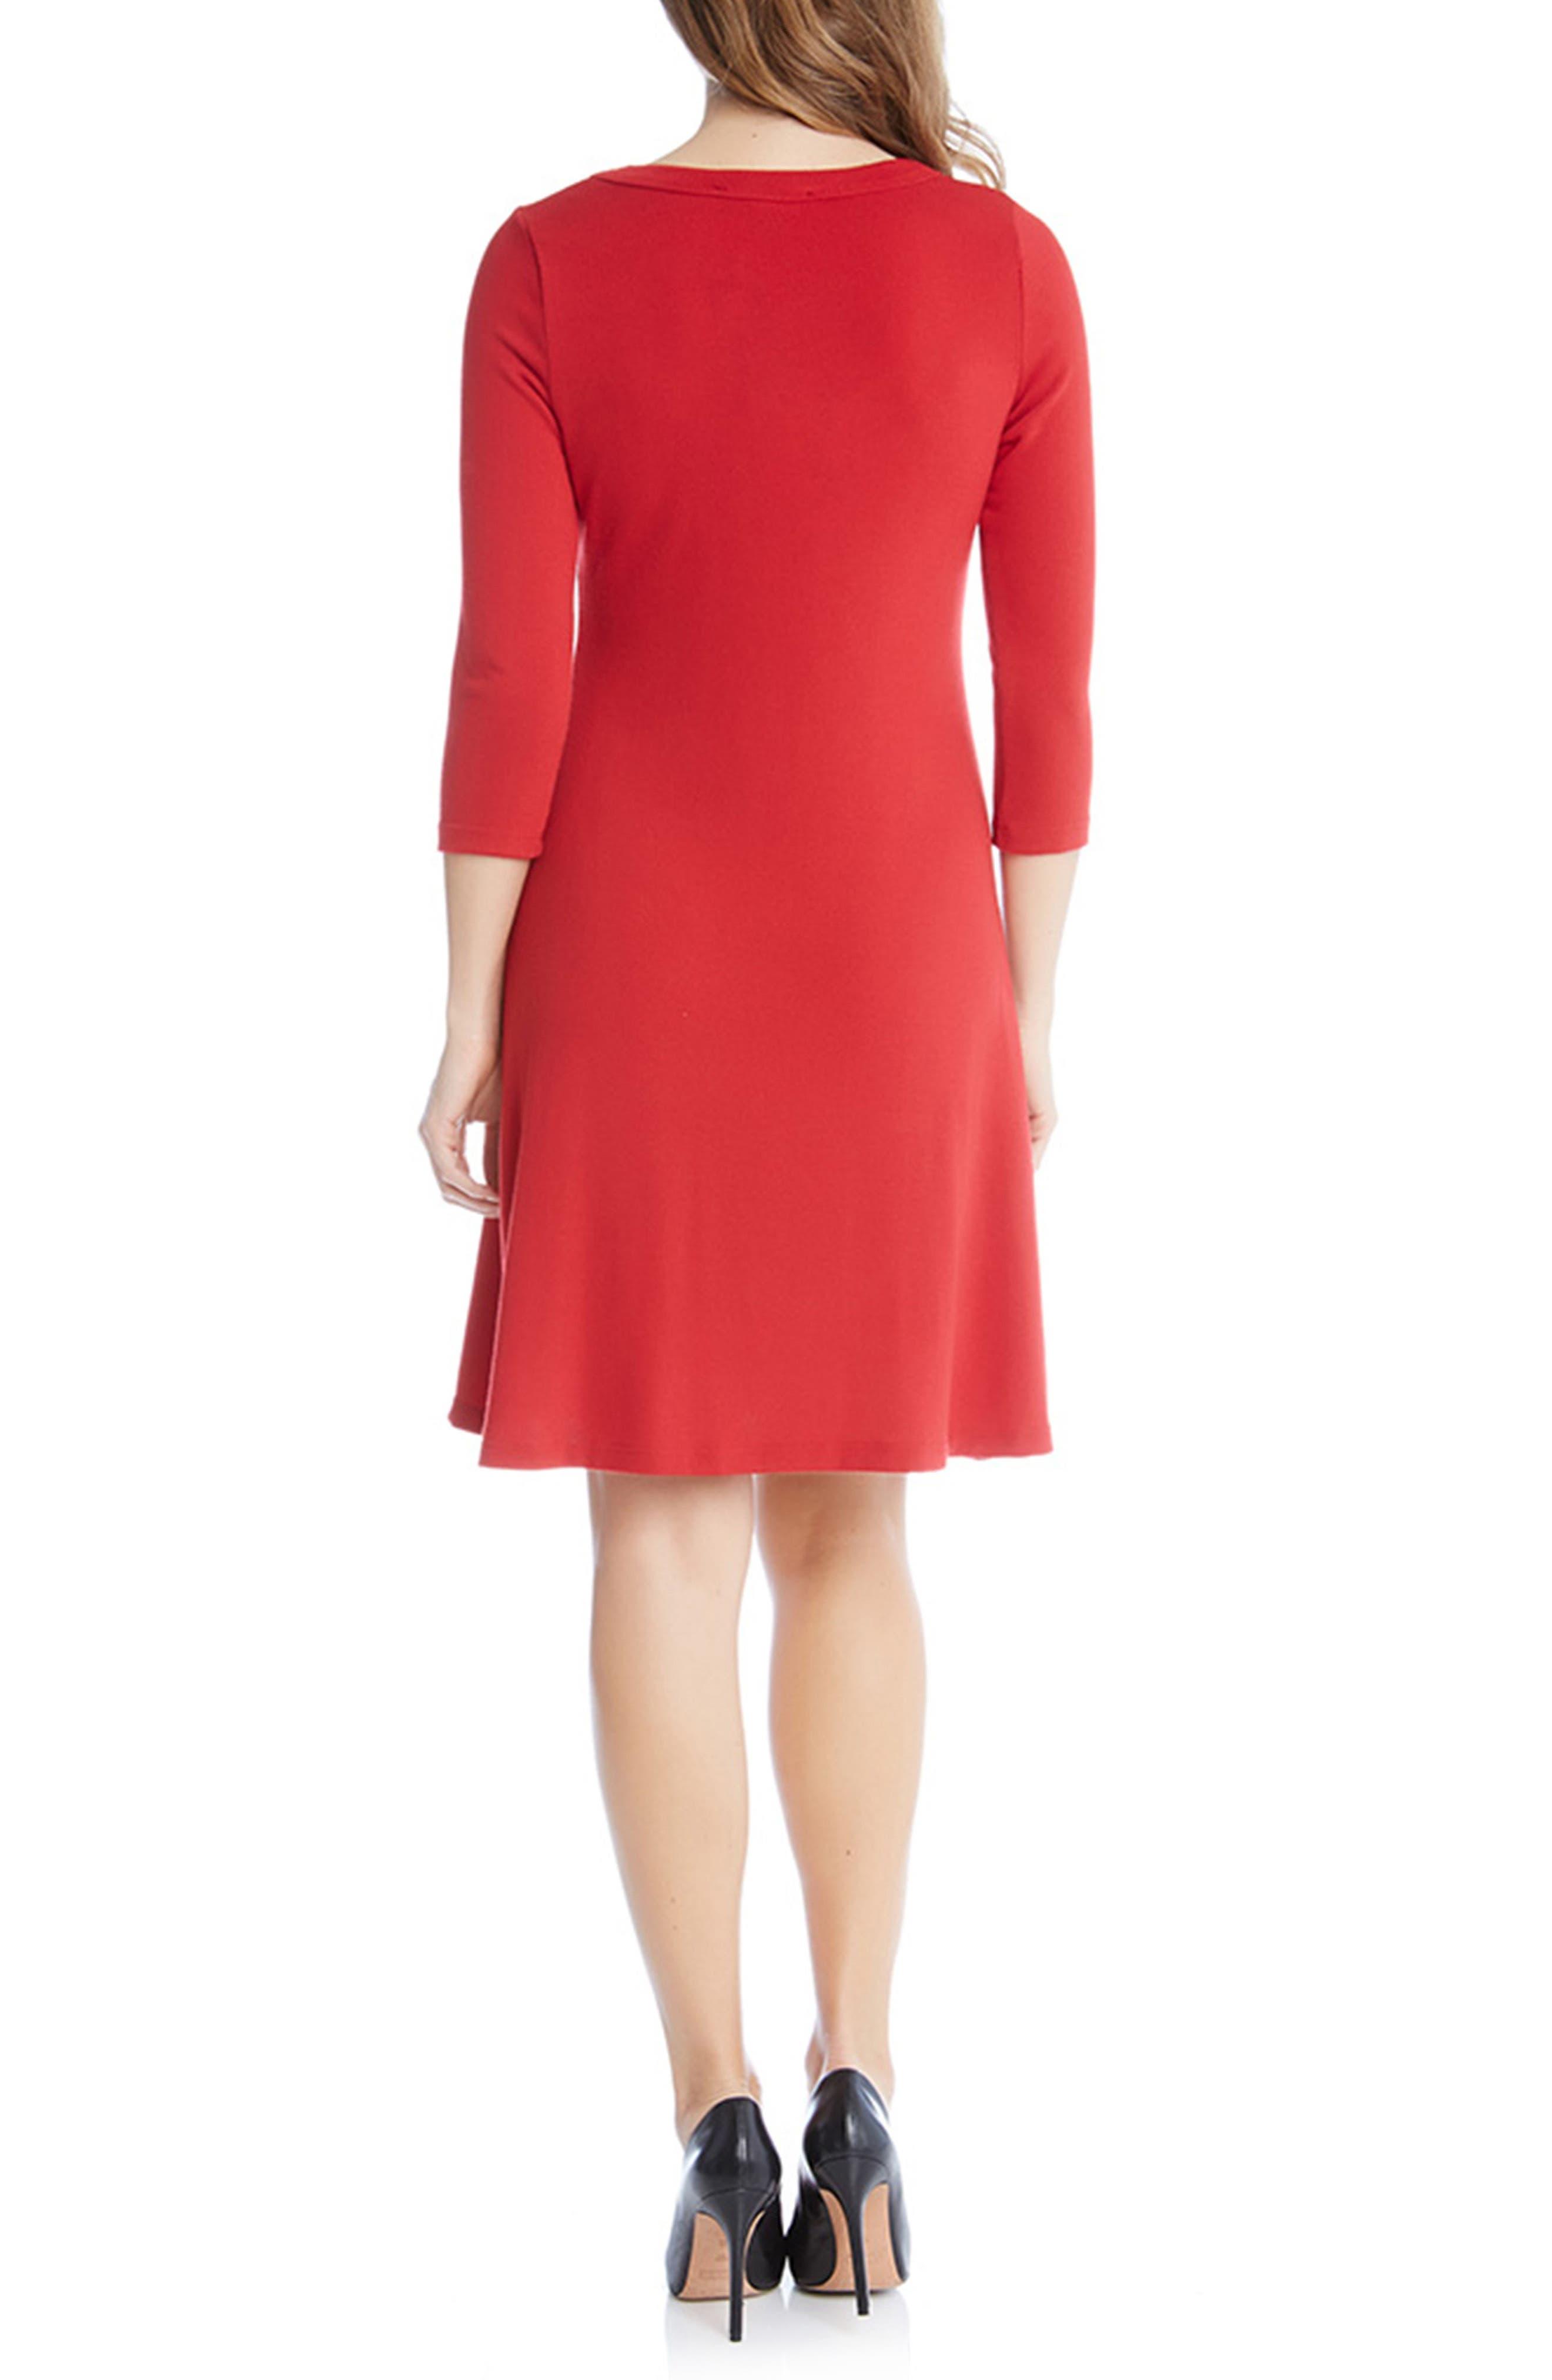 A-Line Sweater Dress,                             Alternate thumbnail 2, color,                             600